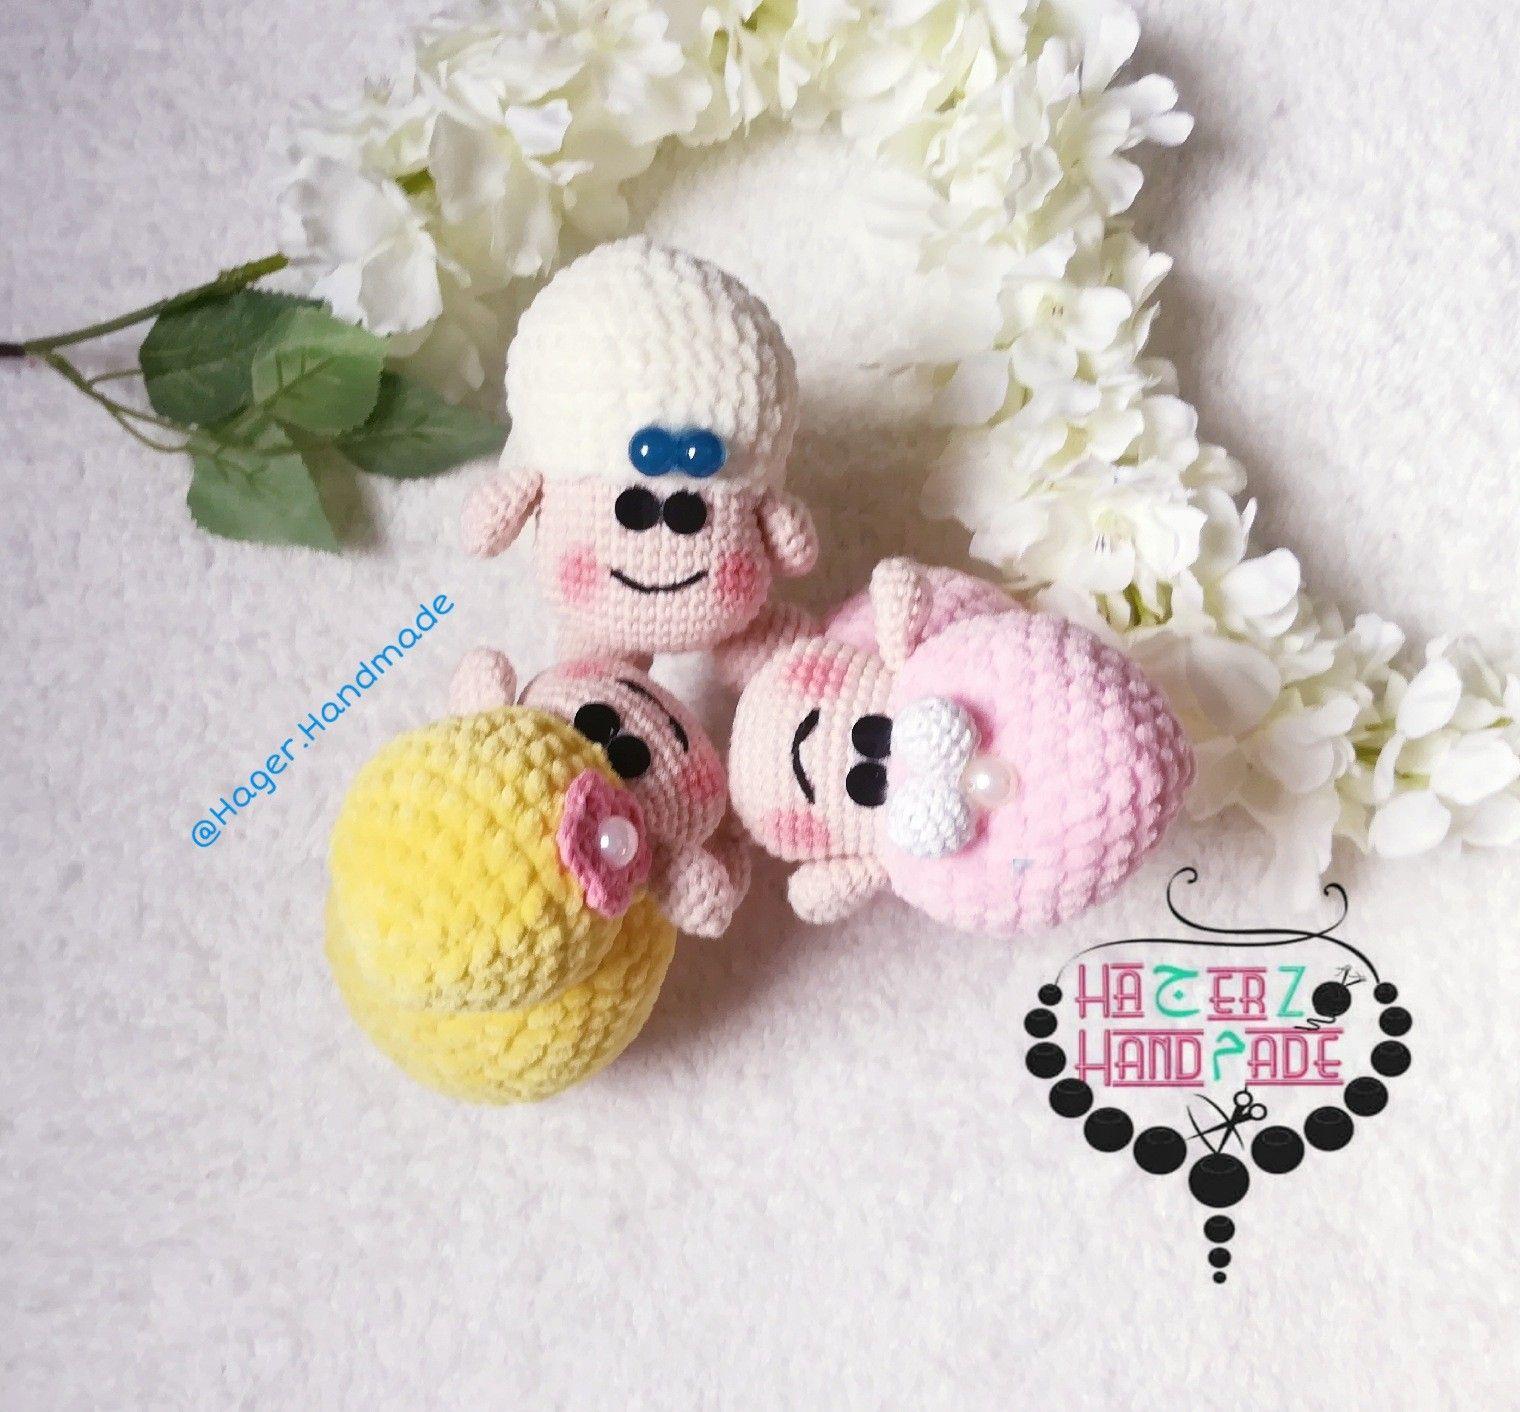 Crochet Amigurumi Sheep Handmade Shop Christmas Ornaments Handmade